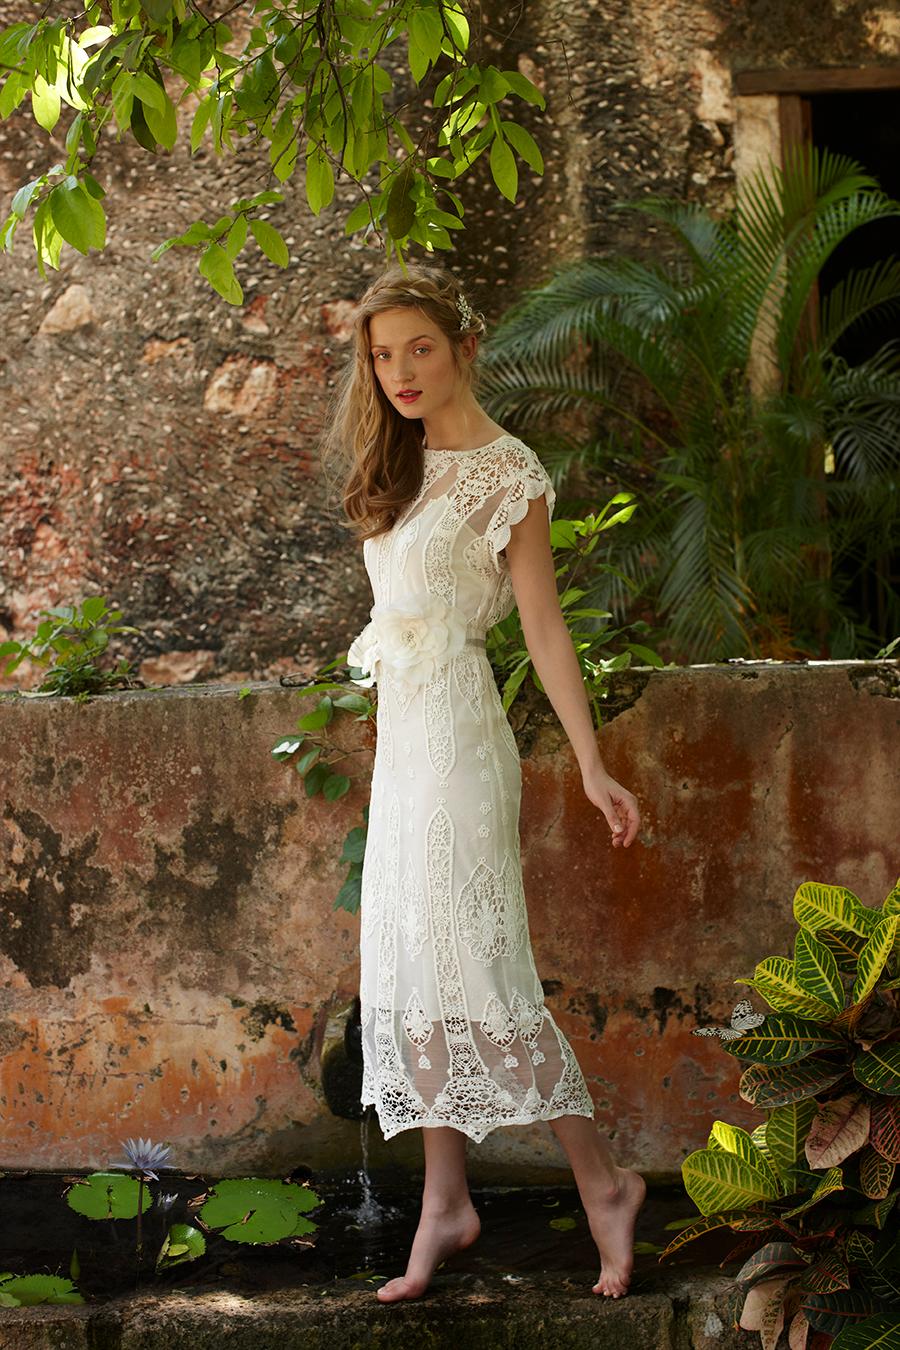 A Tropical Love Affair Bhldn S Summer Wedding Dress Collection Older Bride Wedding Dress Outdoor Wedding Dress Summer Wedding Dress,Chinese Red Dress Wedding